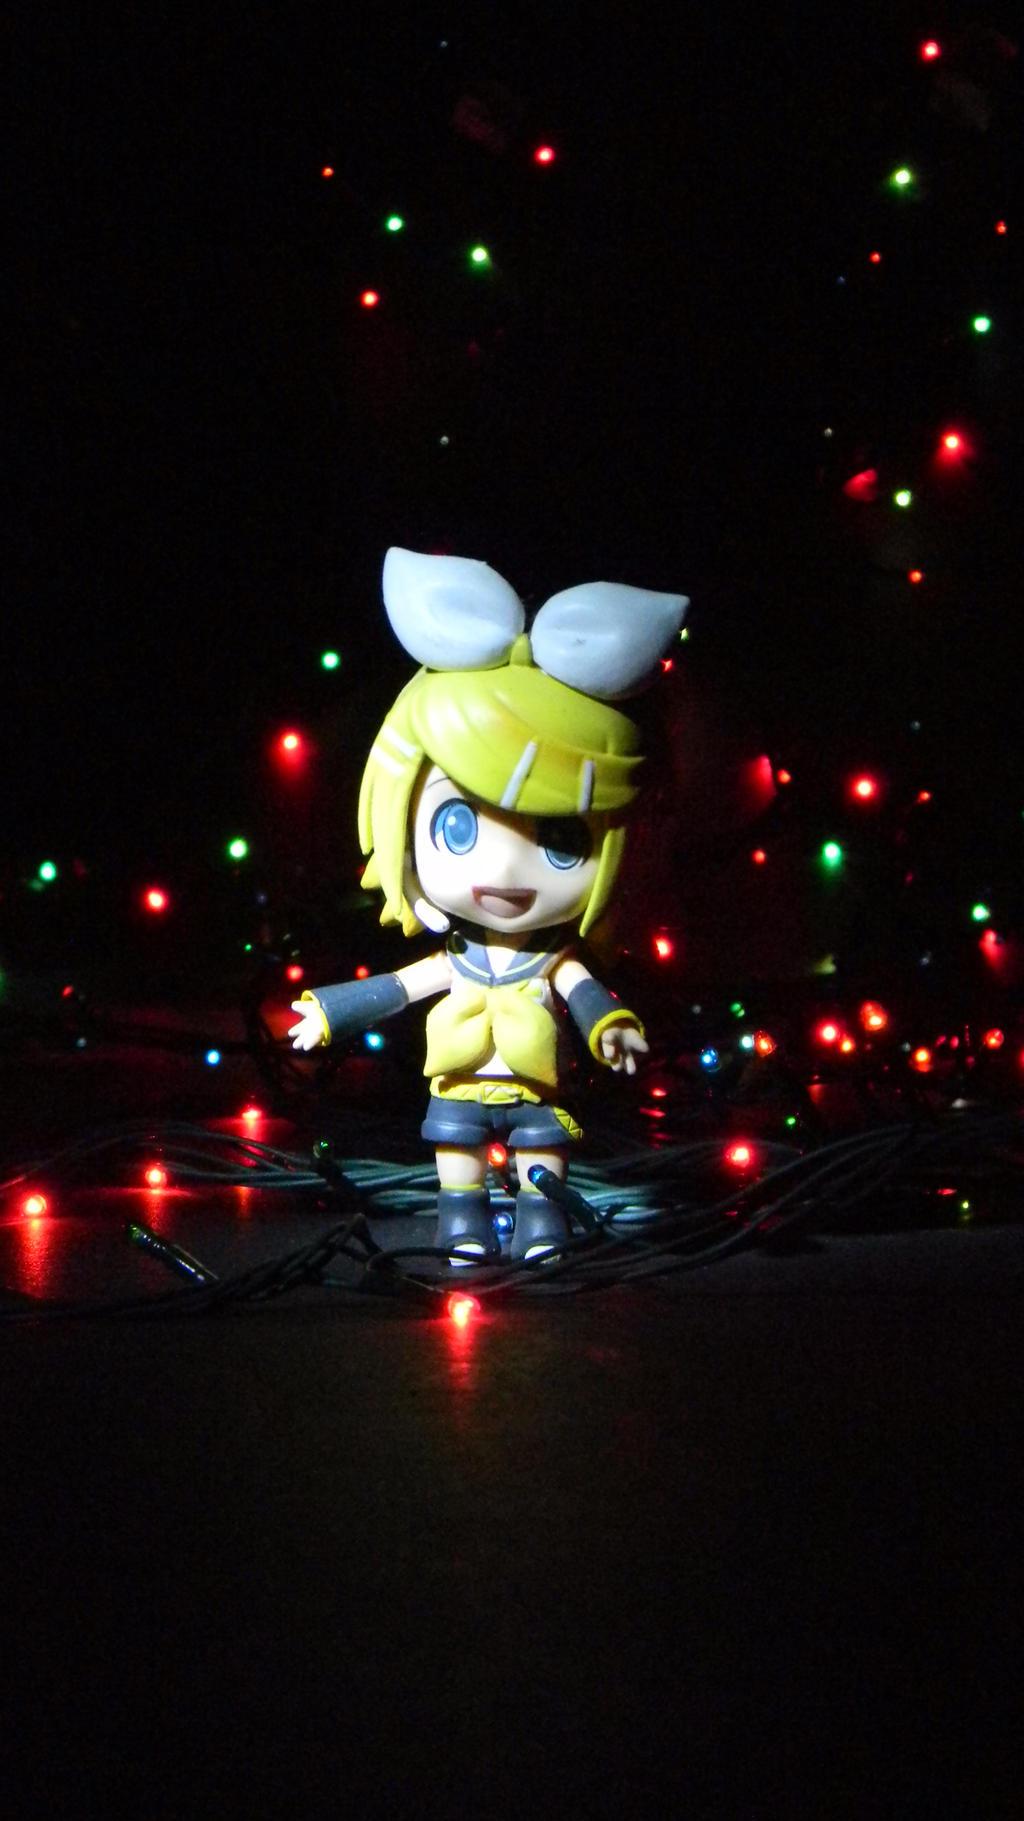 chibi singer by PrincessTeppelin